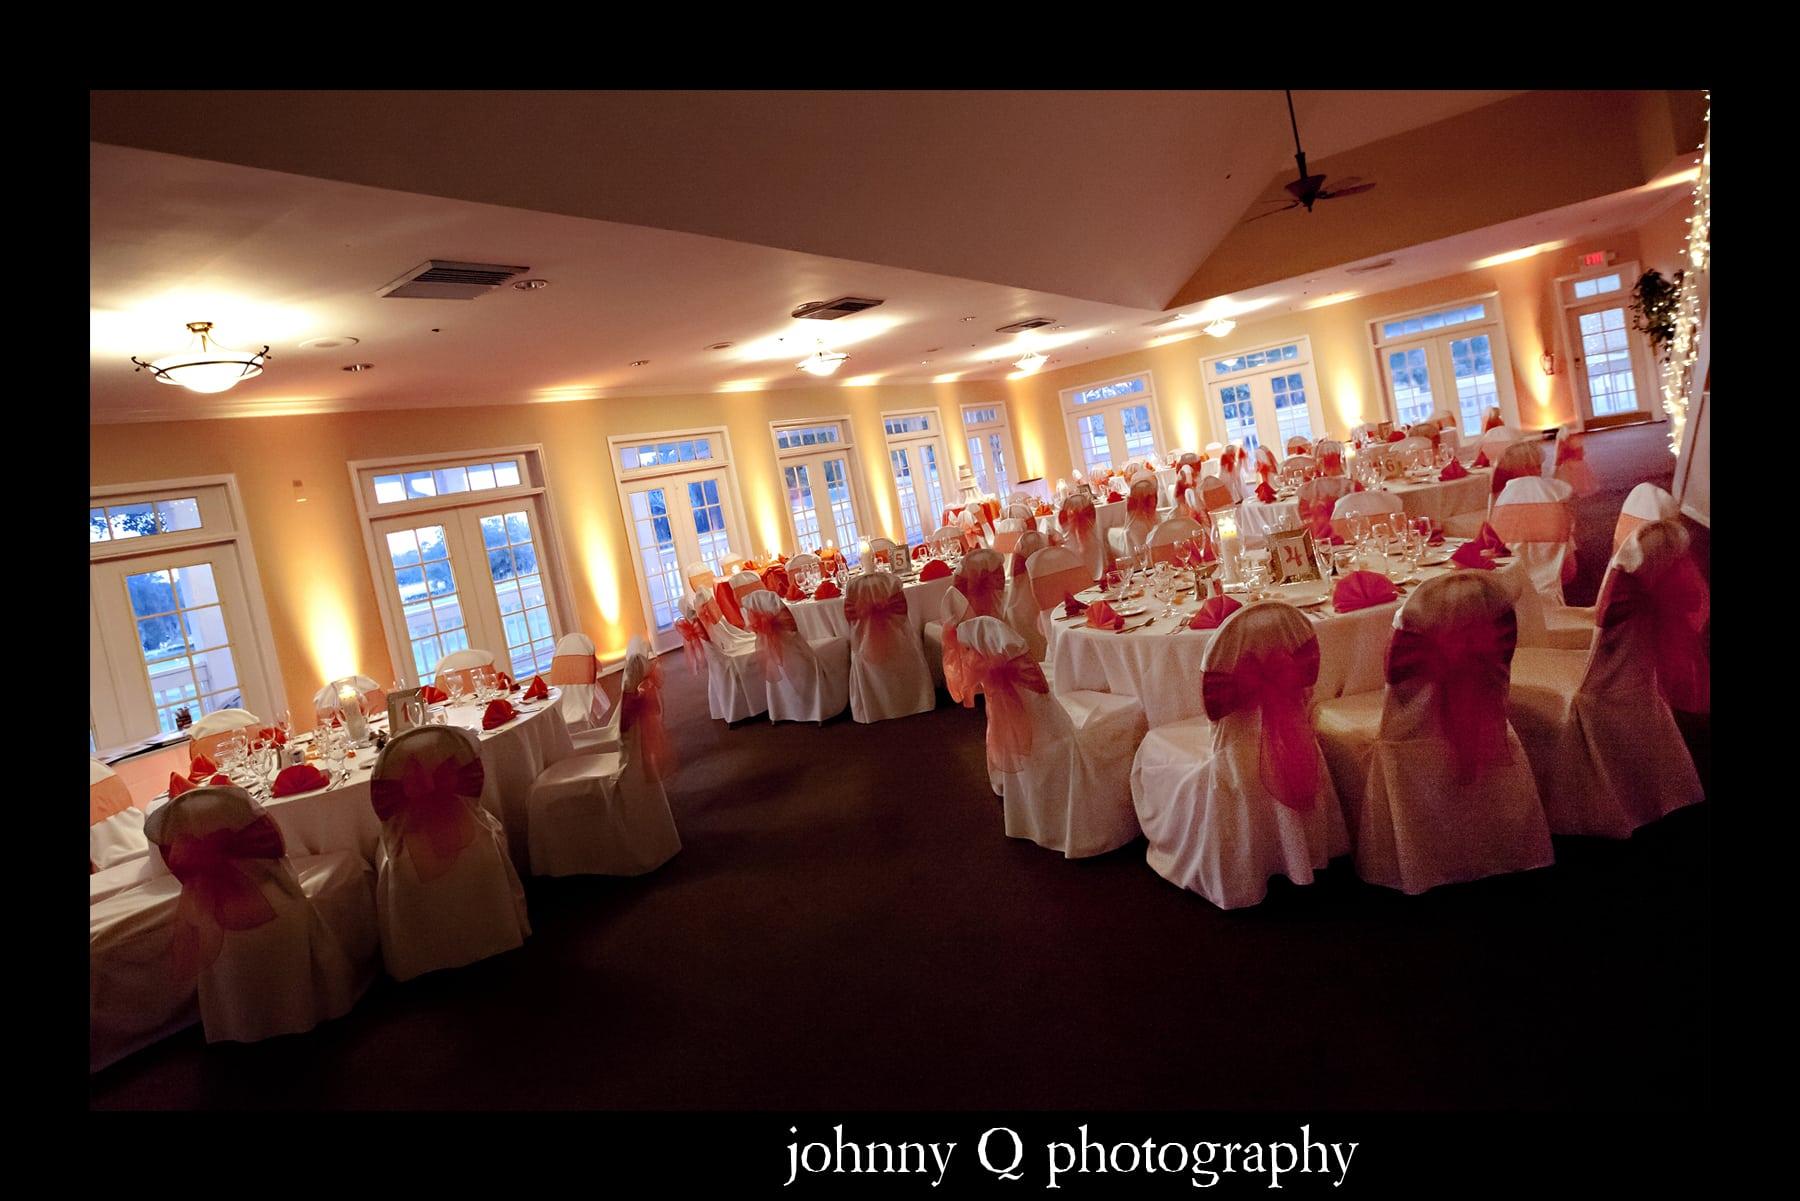 Orlando Wedding Dj Tuscawilla Country Club Johnny Q Photography Orange Uplighting